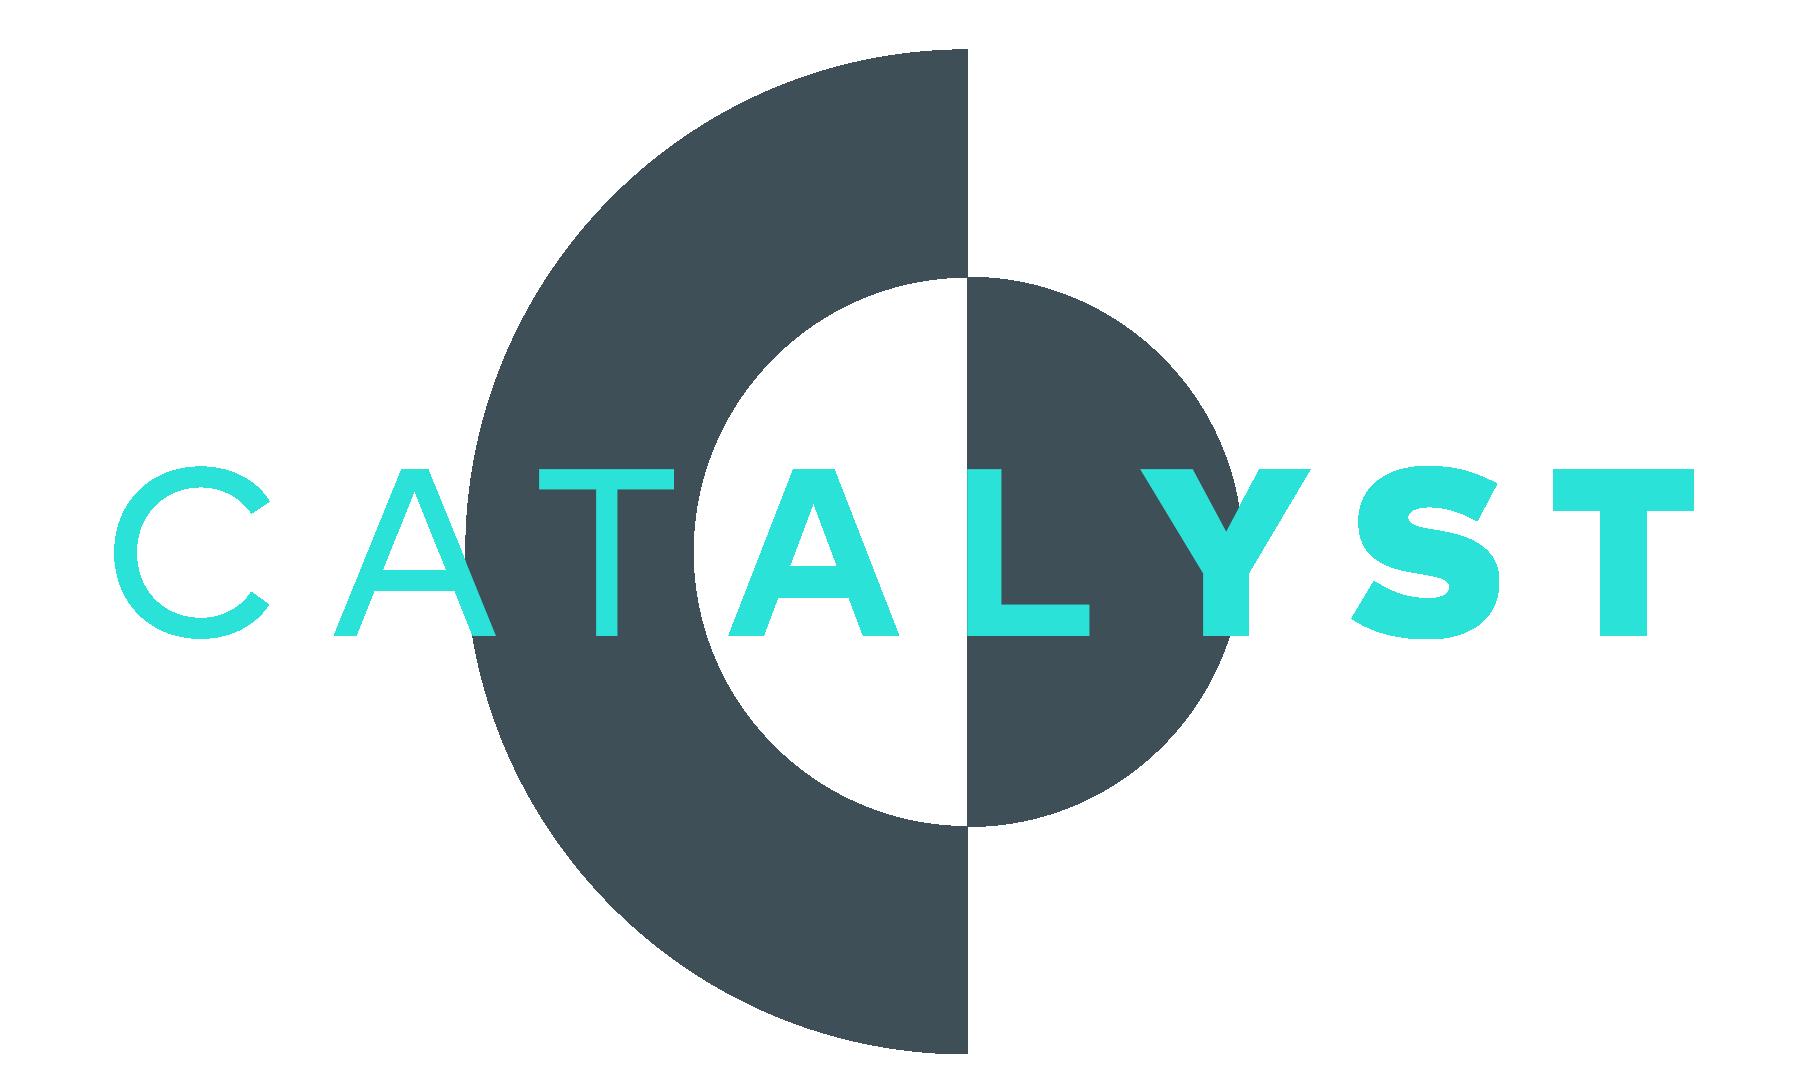 St Pete Catalyst Logo